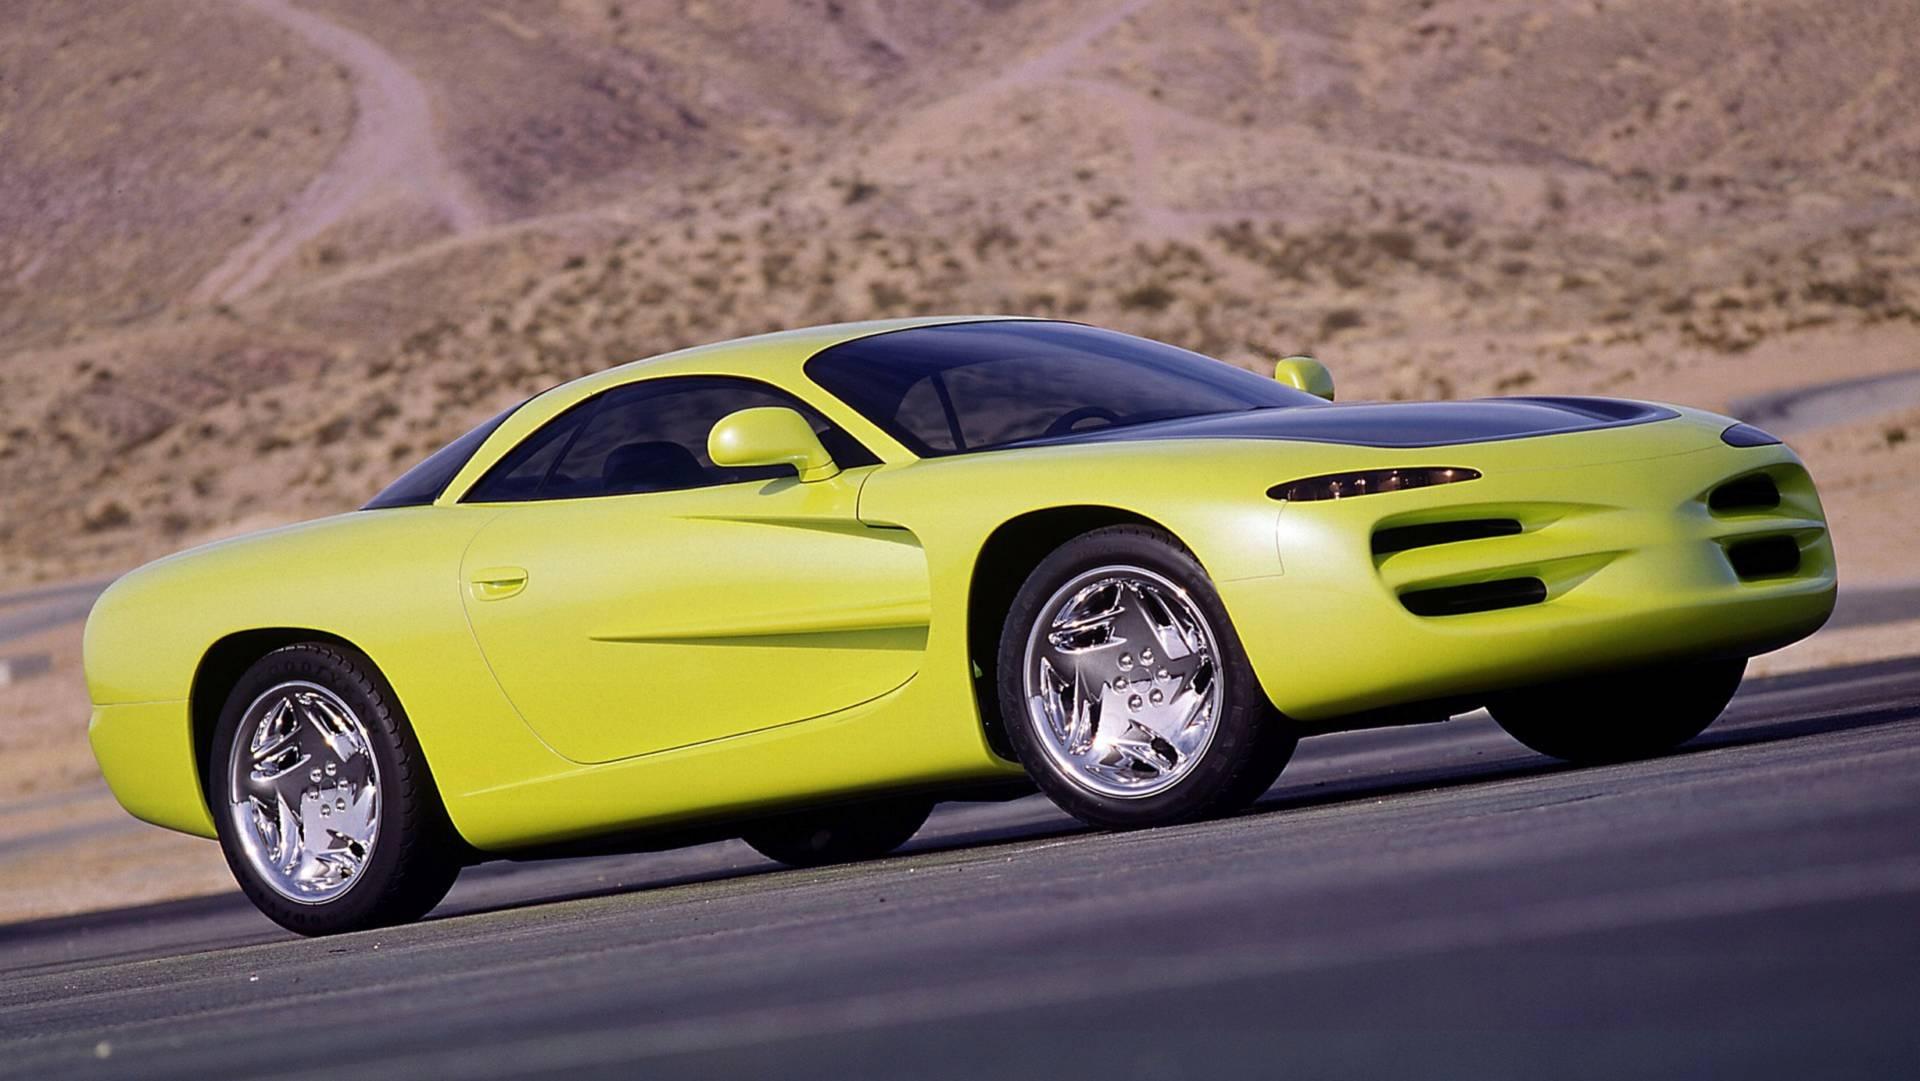 Random Car Review: 1994 Dodge Venom – The False Start Or Testing The Waters?